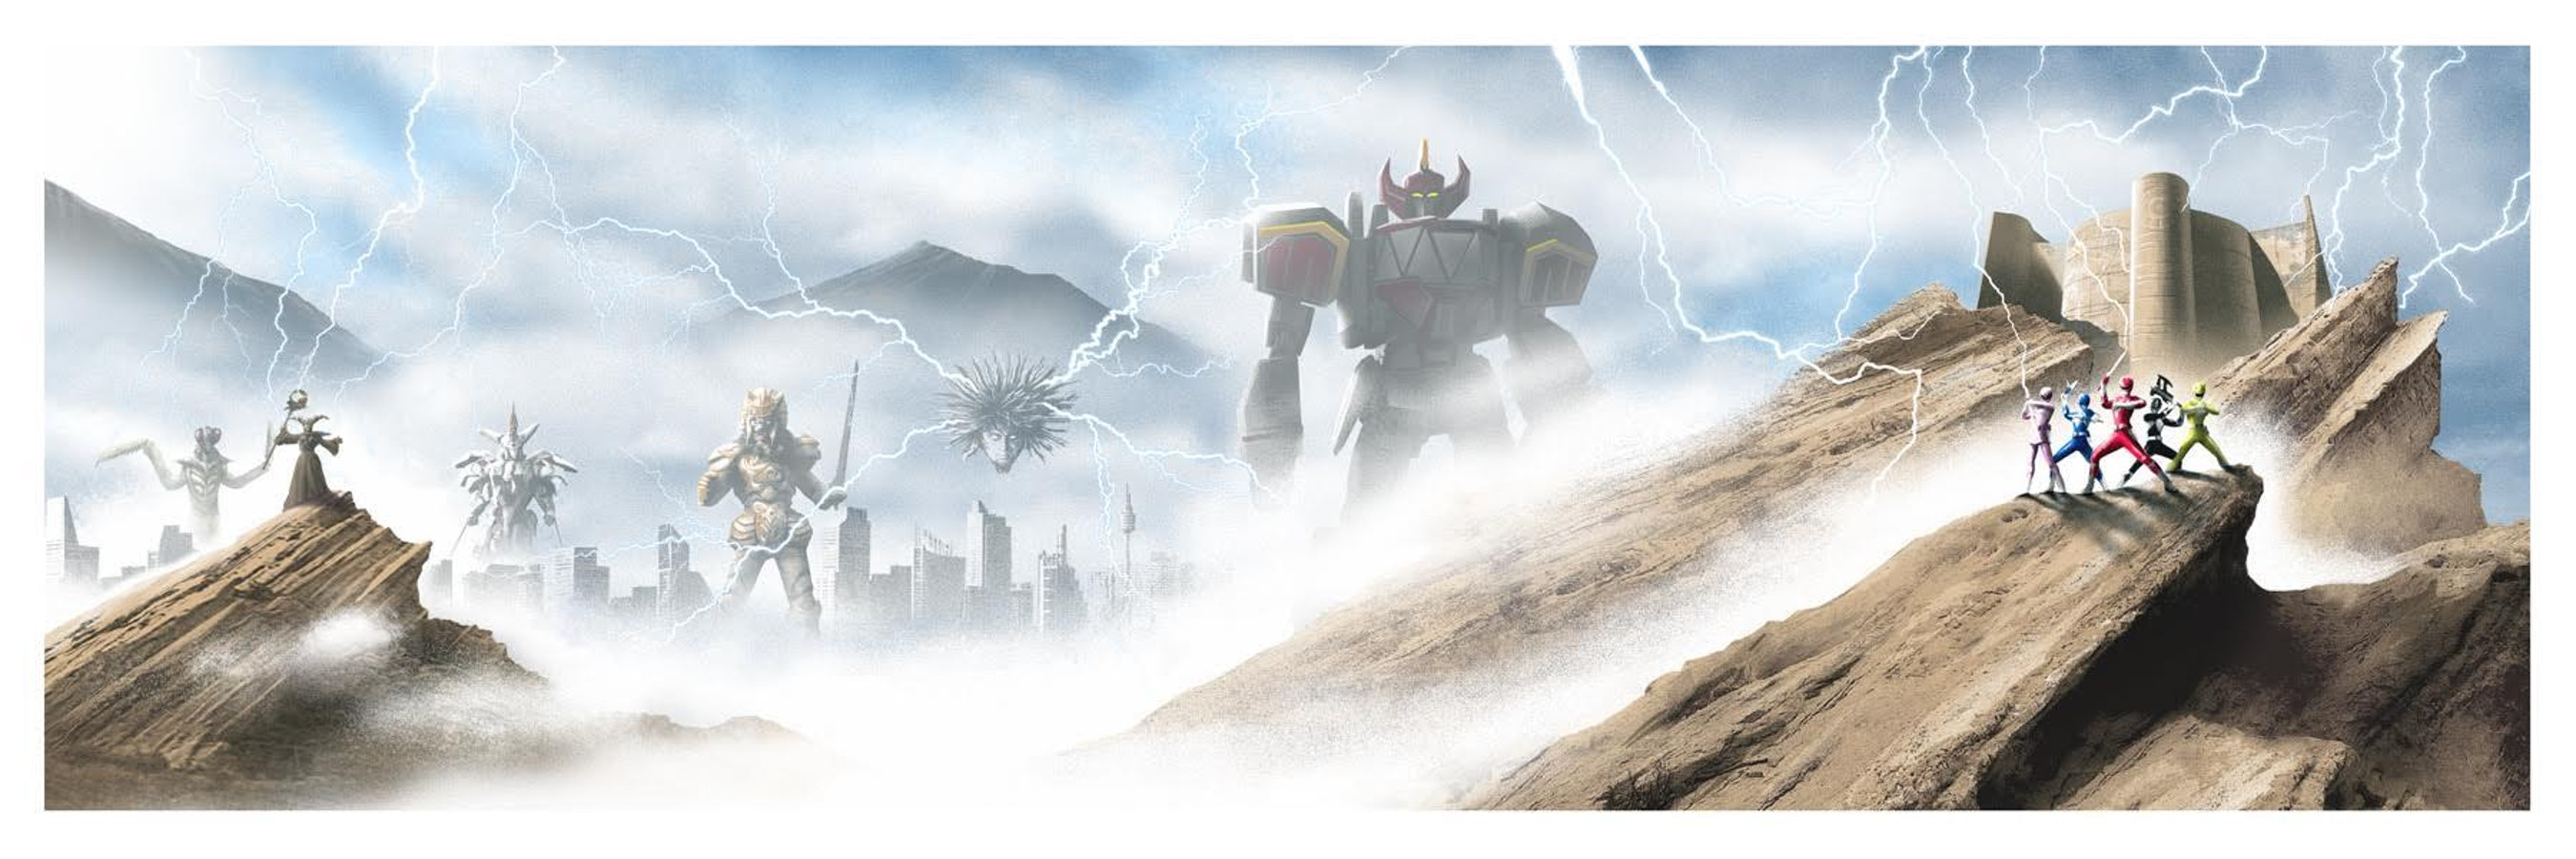 JC Richard's collectible screenprint for 'Power Rangers: The OG Soundtrack.'